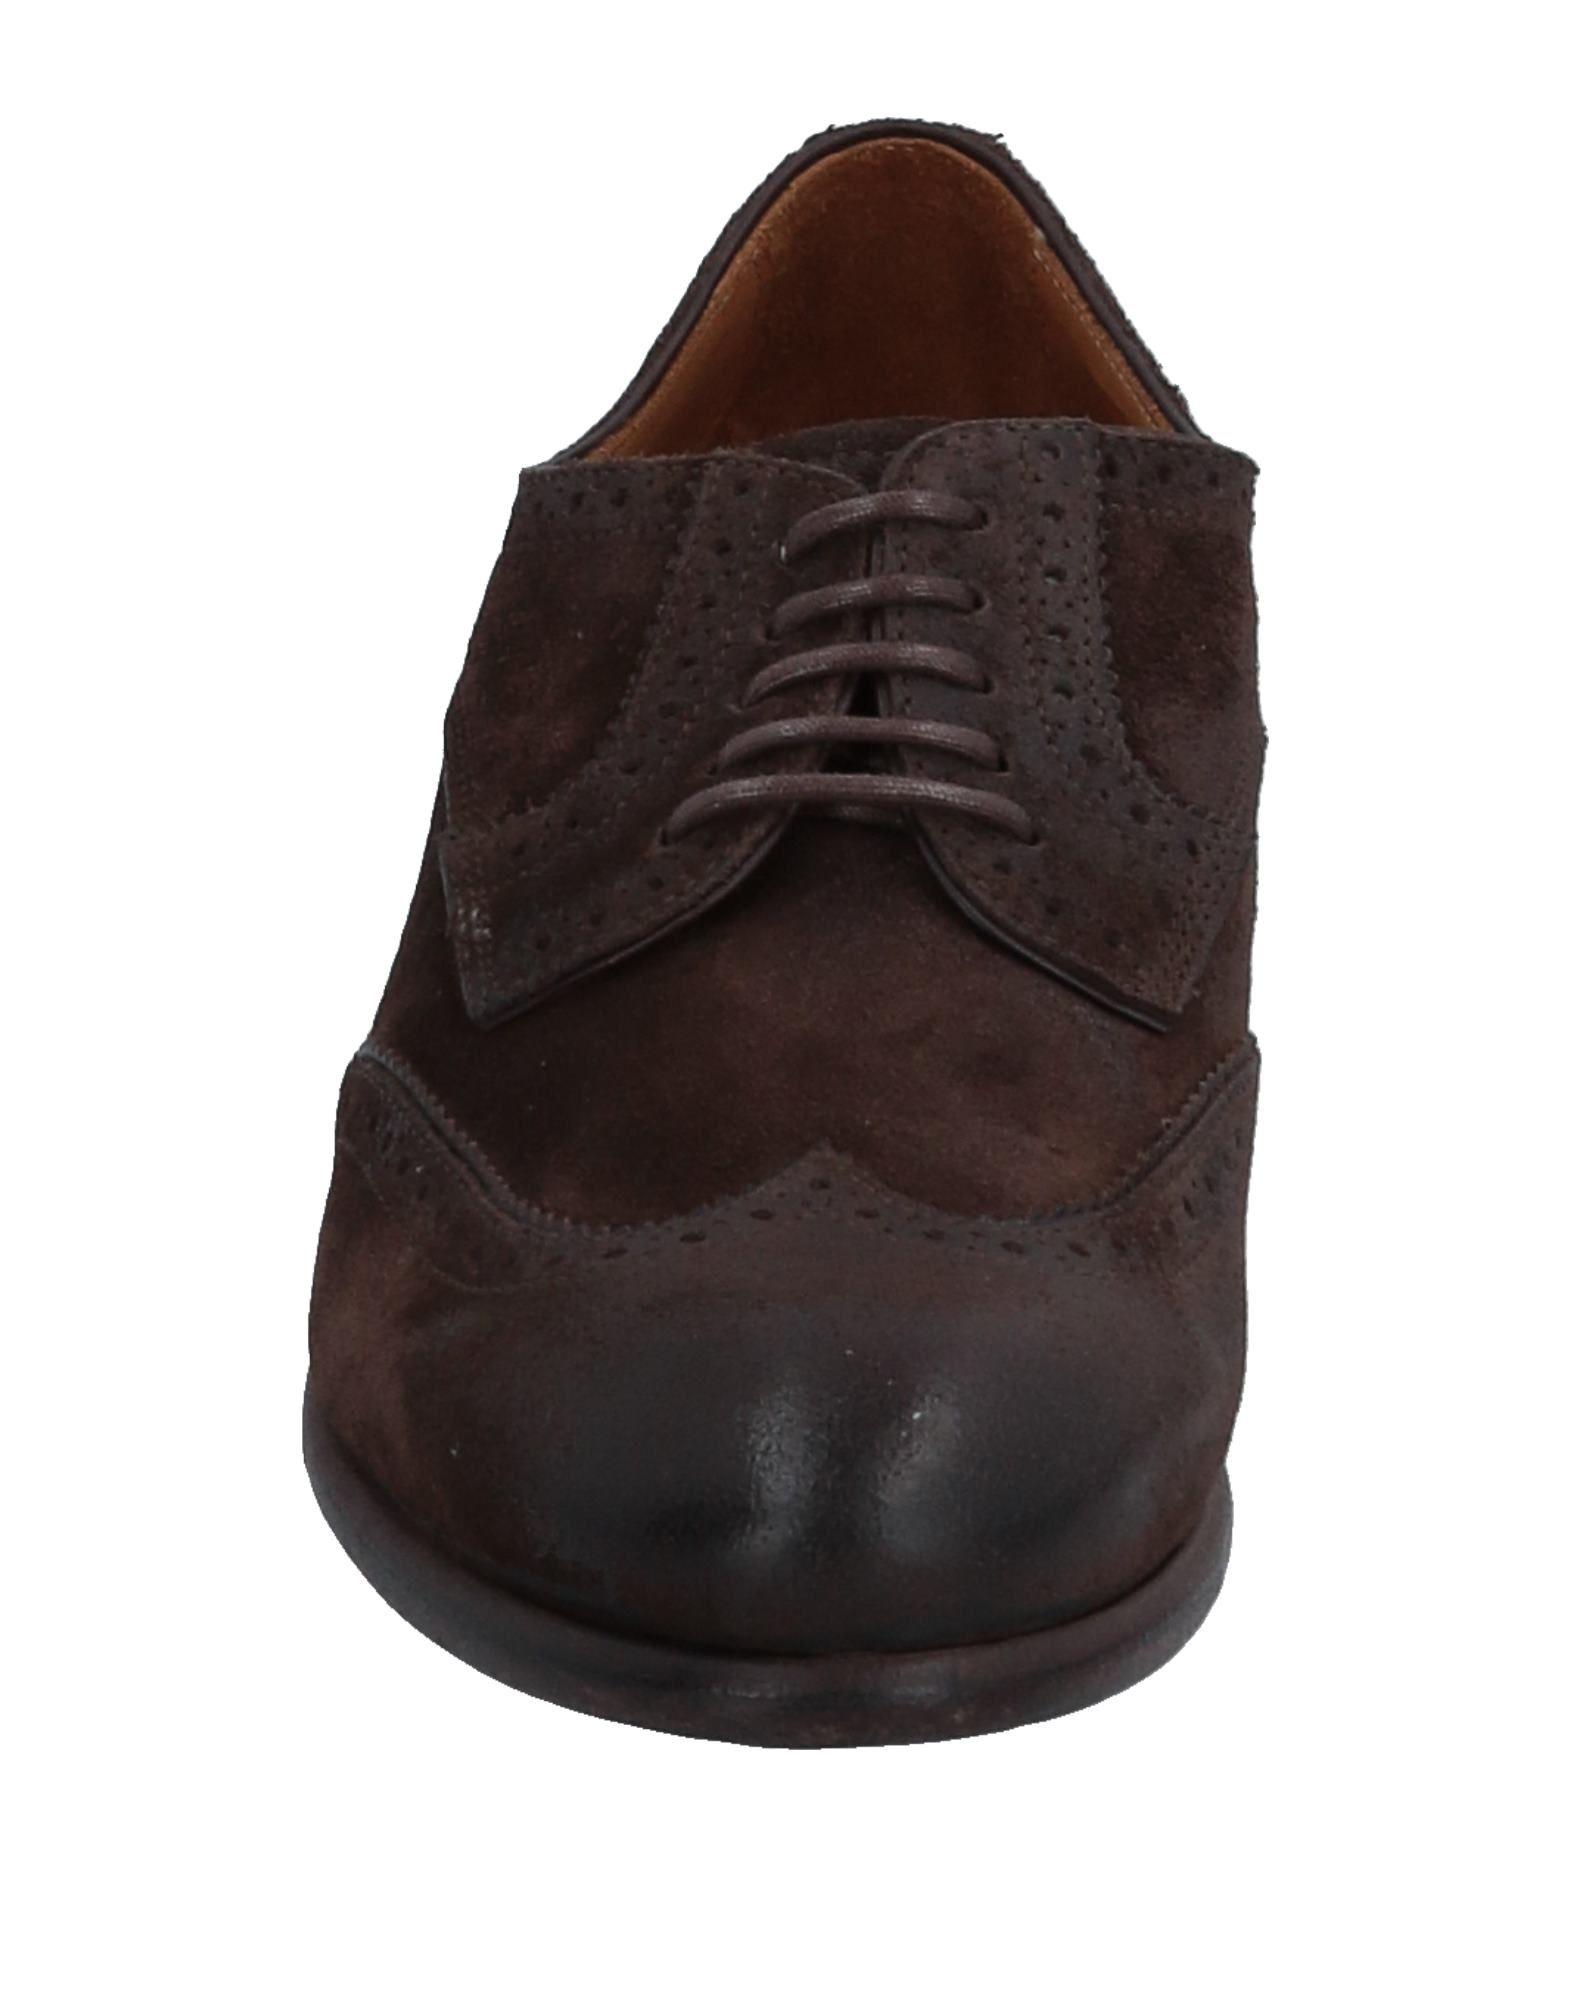 N.D.C. Made By Hand Schnürschuhe Damen Schuhe  11521547MCGut aussehende strapazierfähige Schuhe Damen 86b739